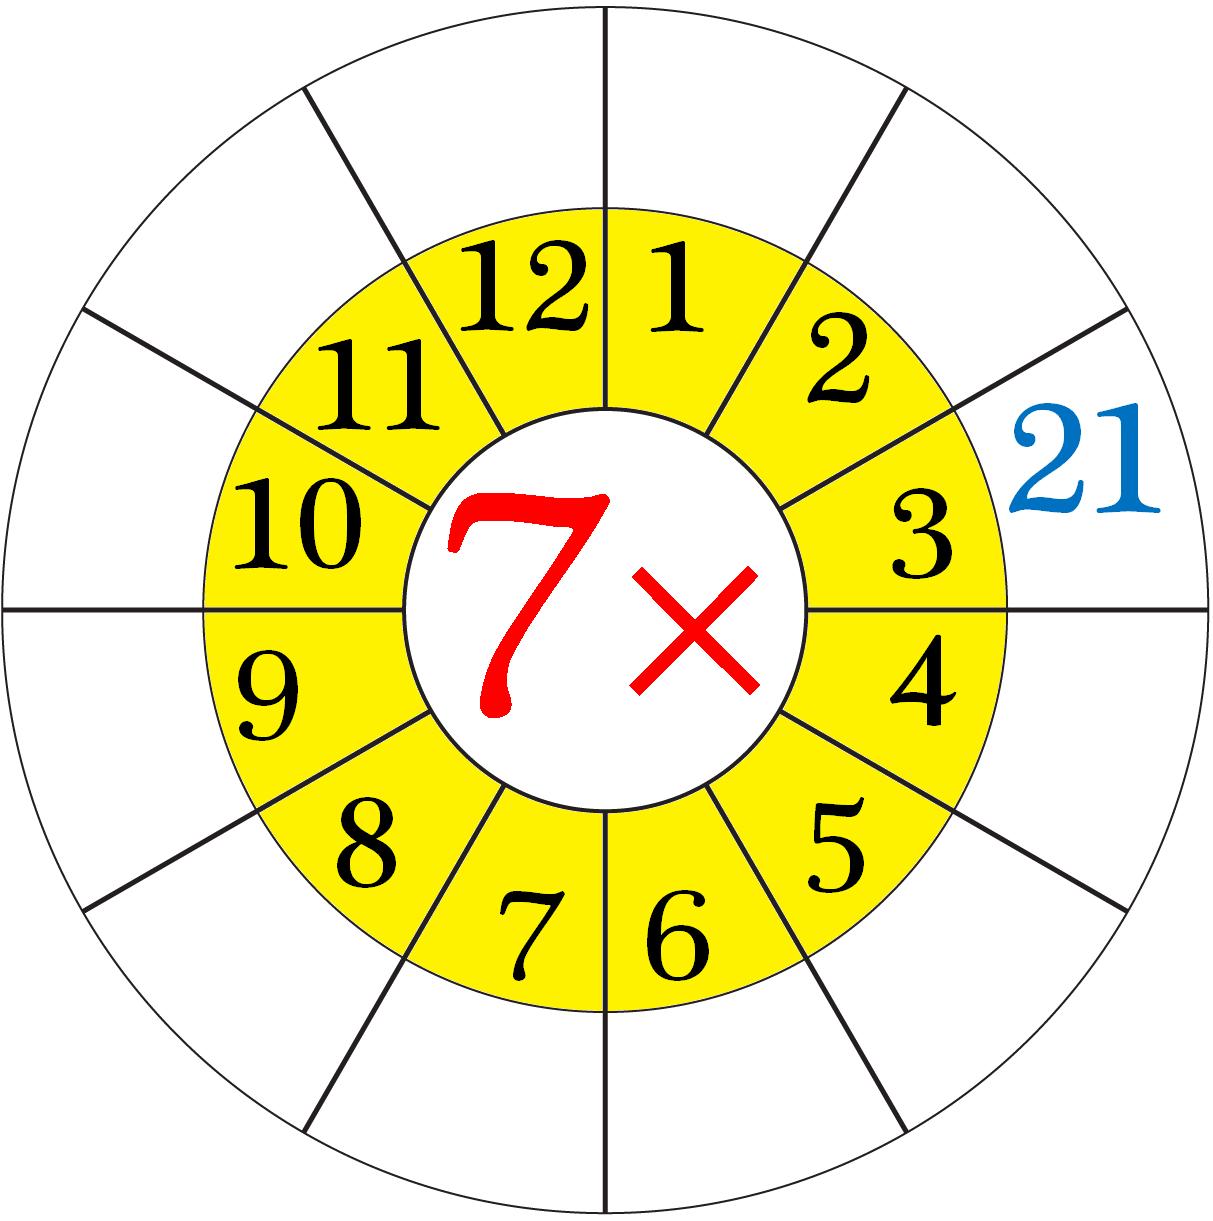 7 Times Tables Worksheet